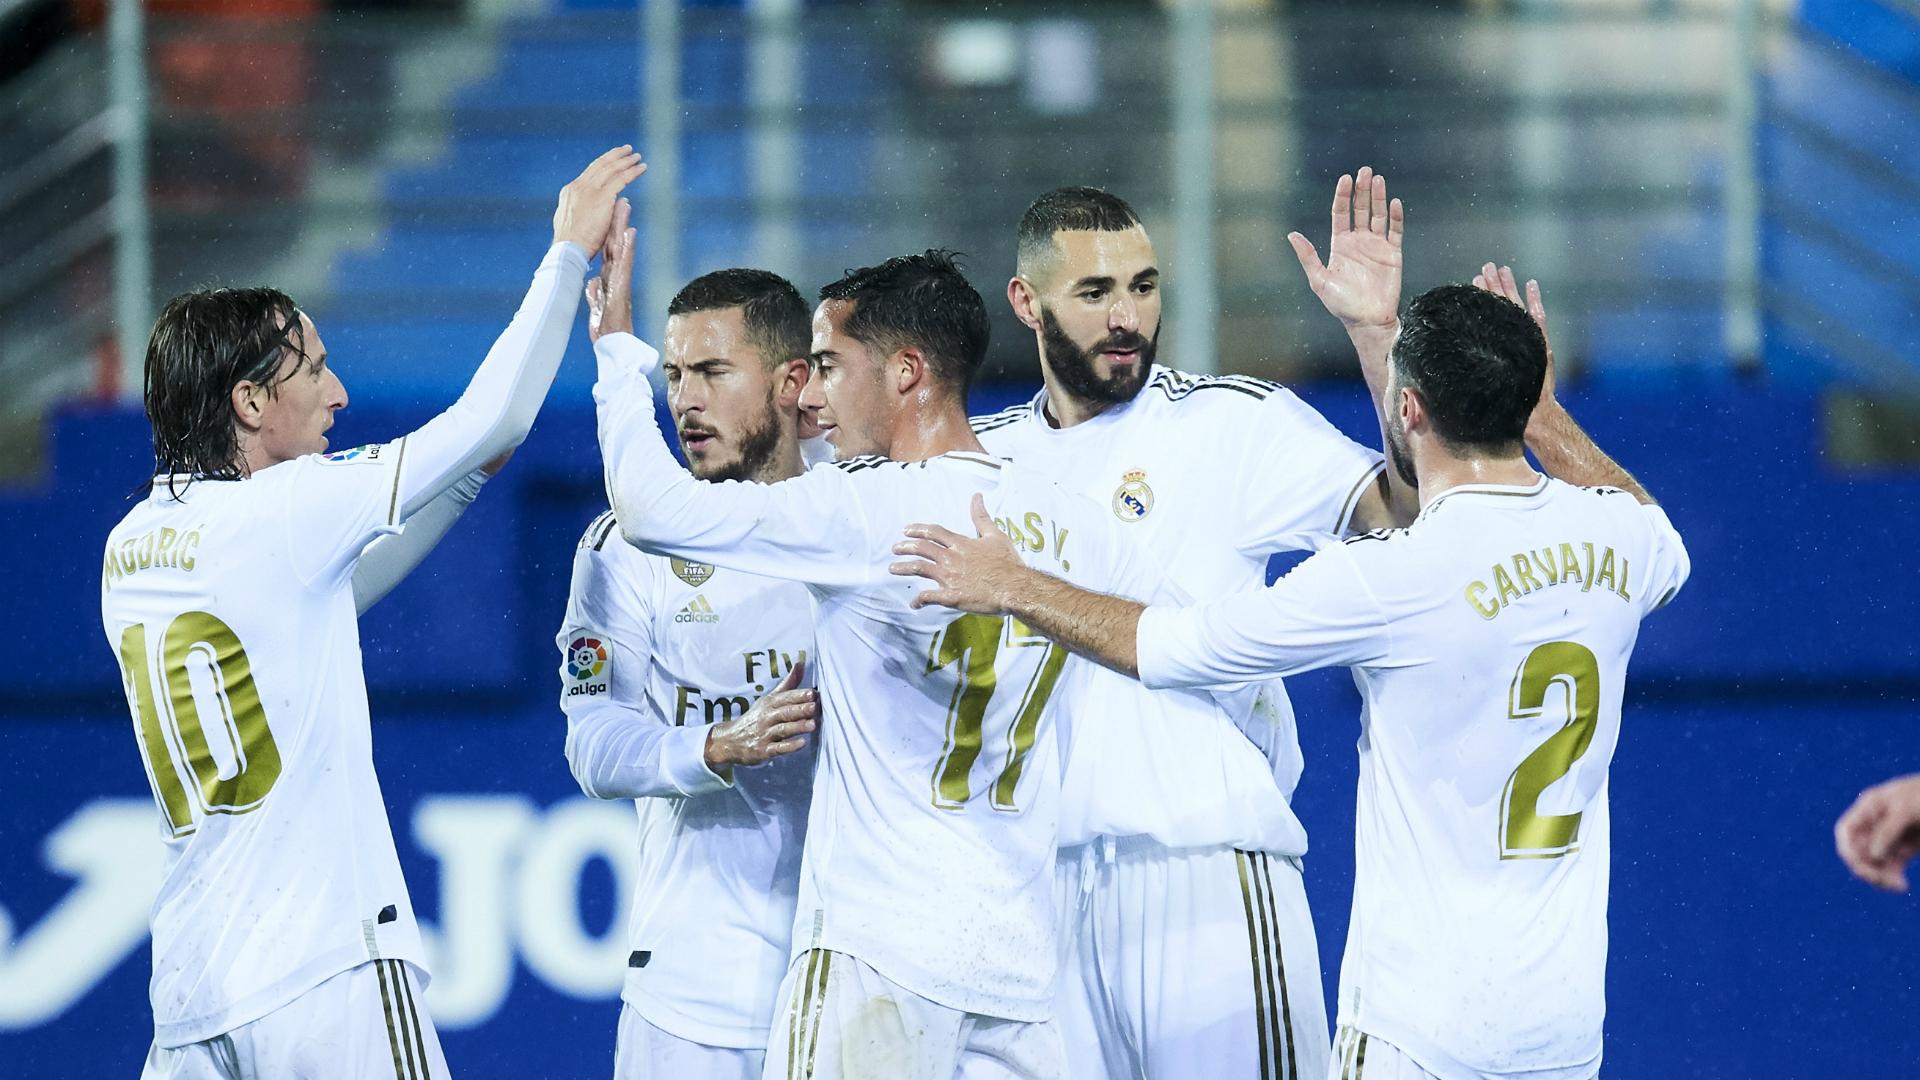 Eibar 0-4 Real Madrid: Benzema double helps lift Zidane's men into top spot